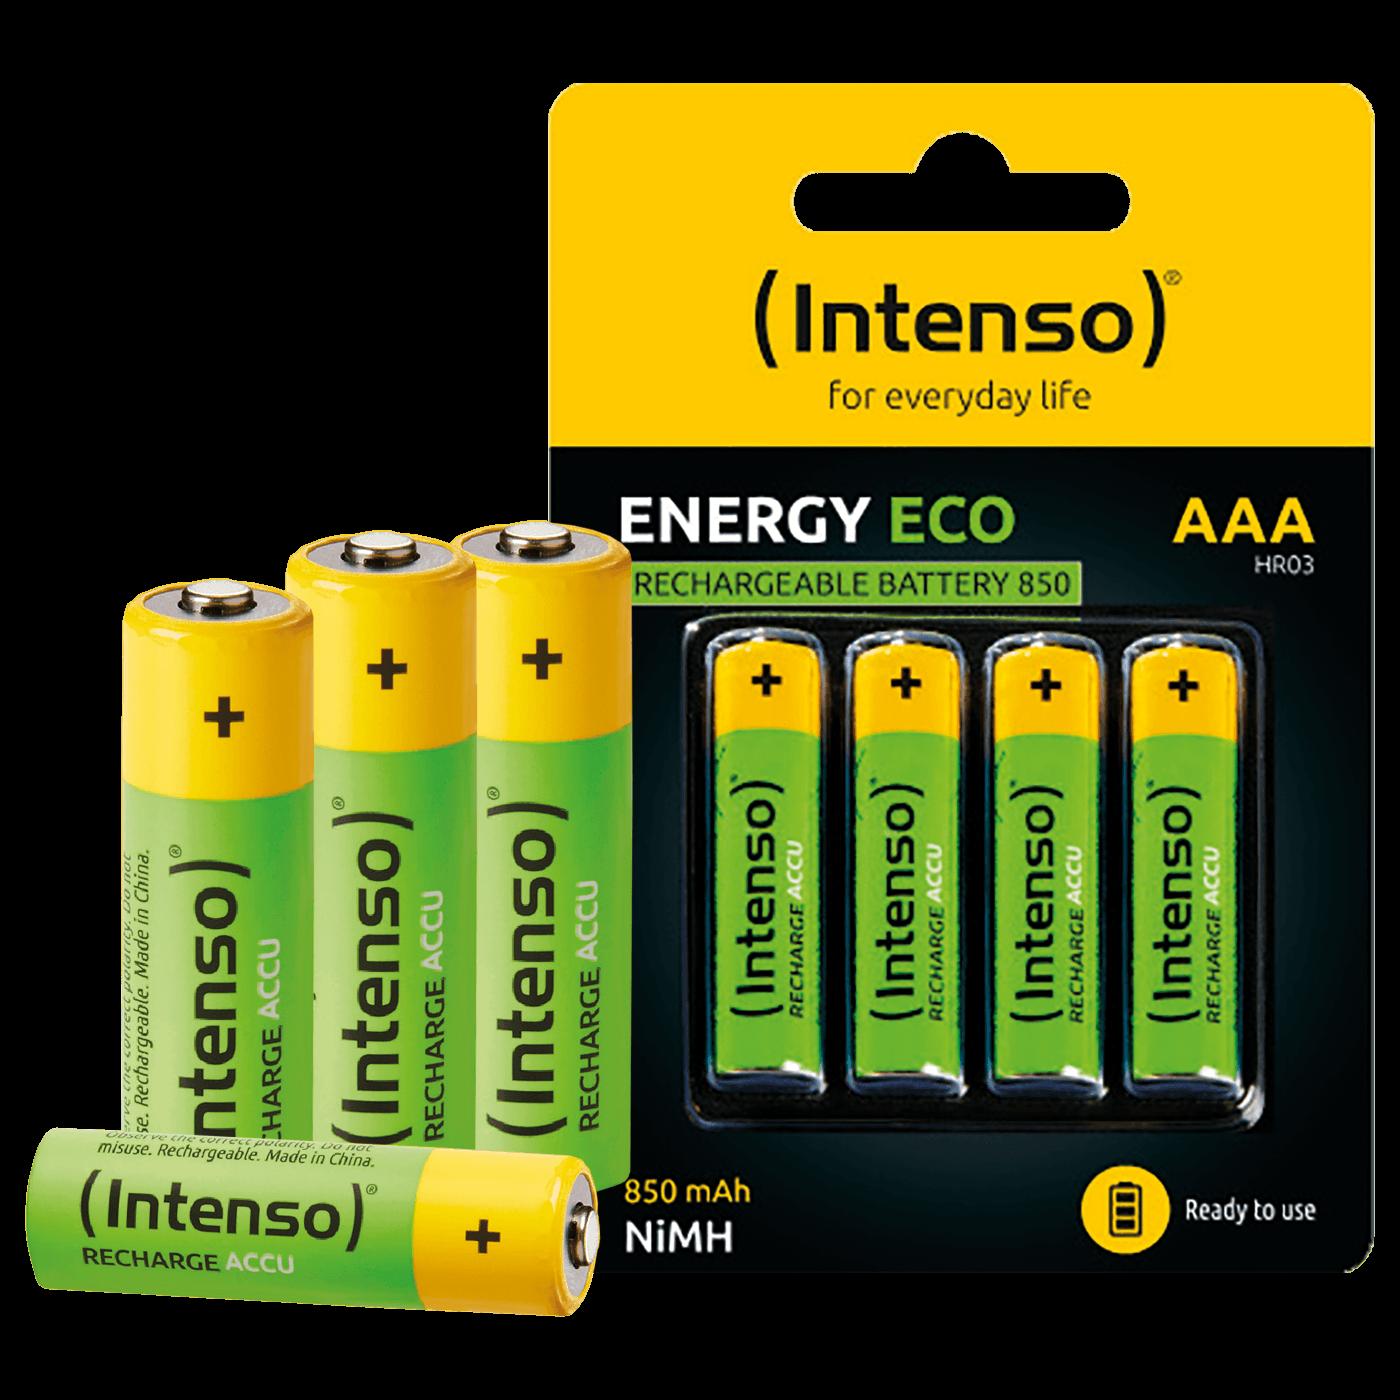 Baterija punjiva AAA / HR03, 850 mAh, blister 4 kom